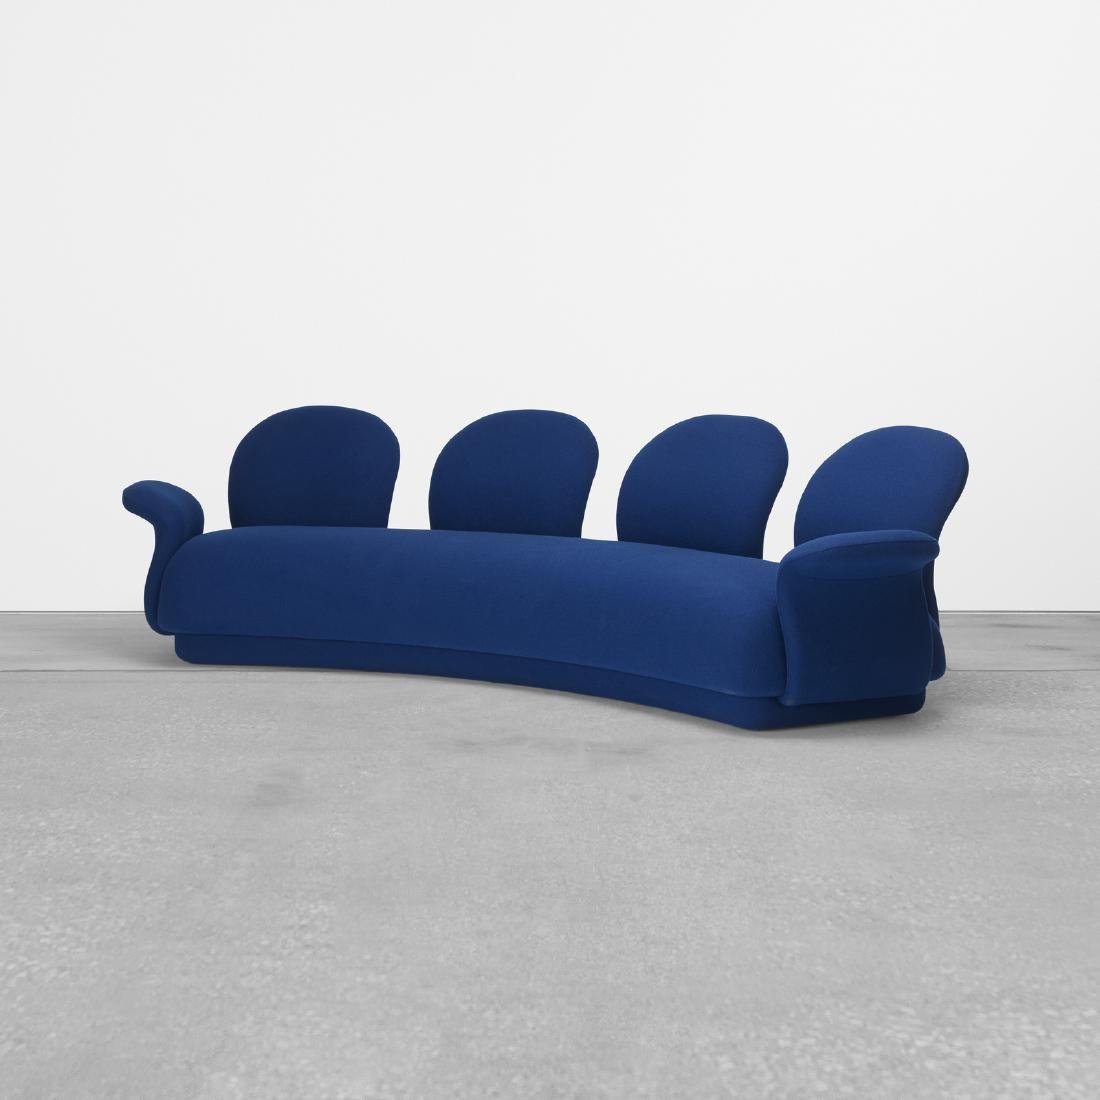 Pierre Paulin, Multimo sofa, model 282